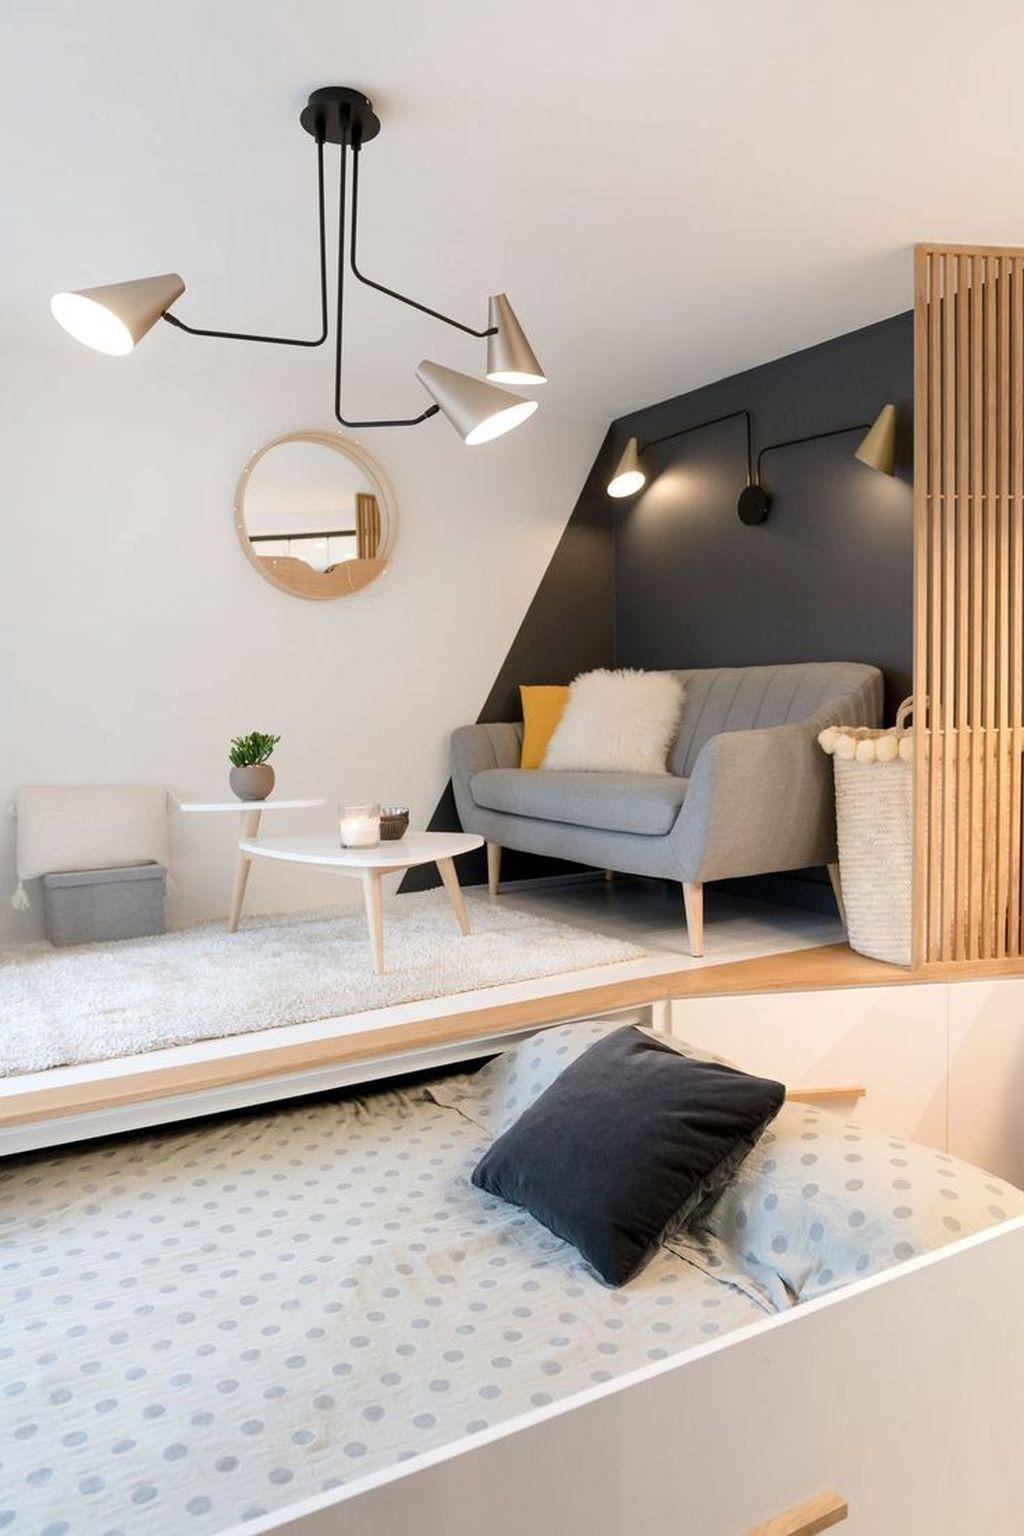 37 Elegant Renovation Design Ideas For Studio Apartment Studio Apartment Design Apartment Design Studio Apartment Layout